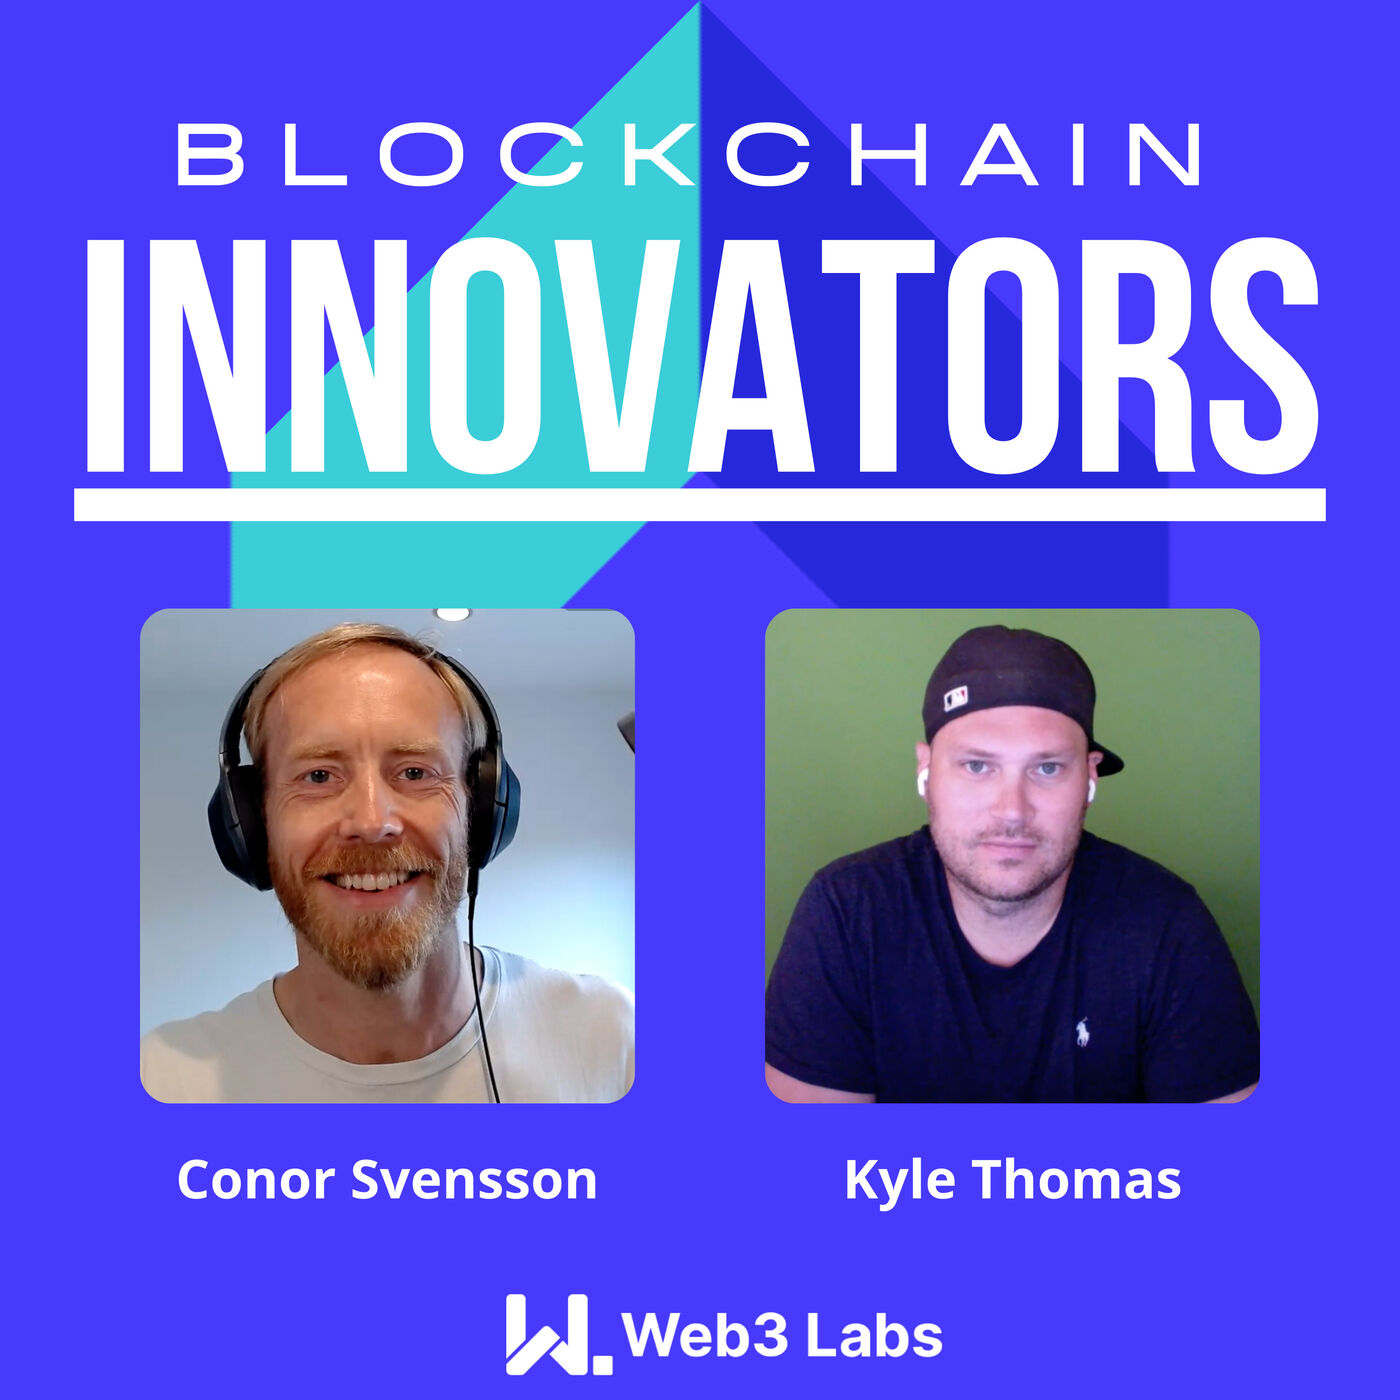 Blockchain Innovators with Conor Svensson and Kyle Thomas